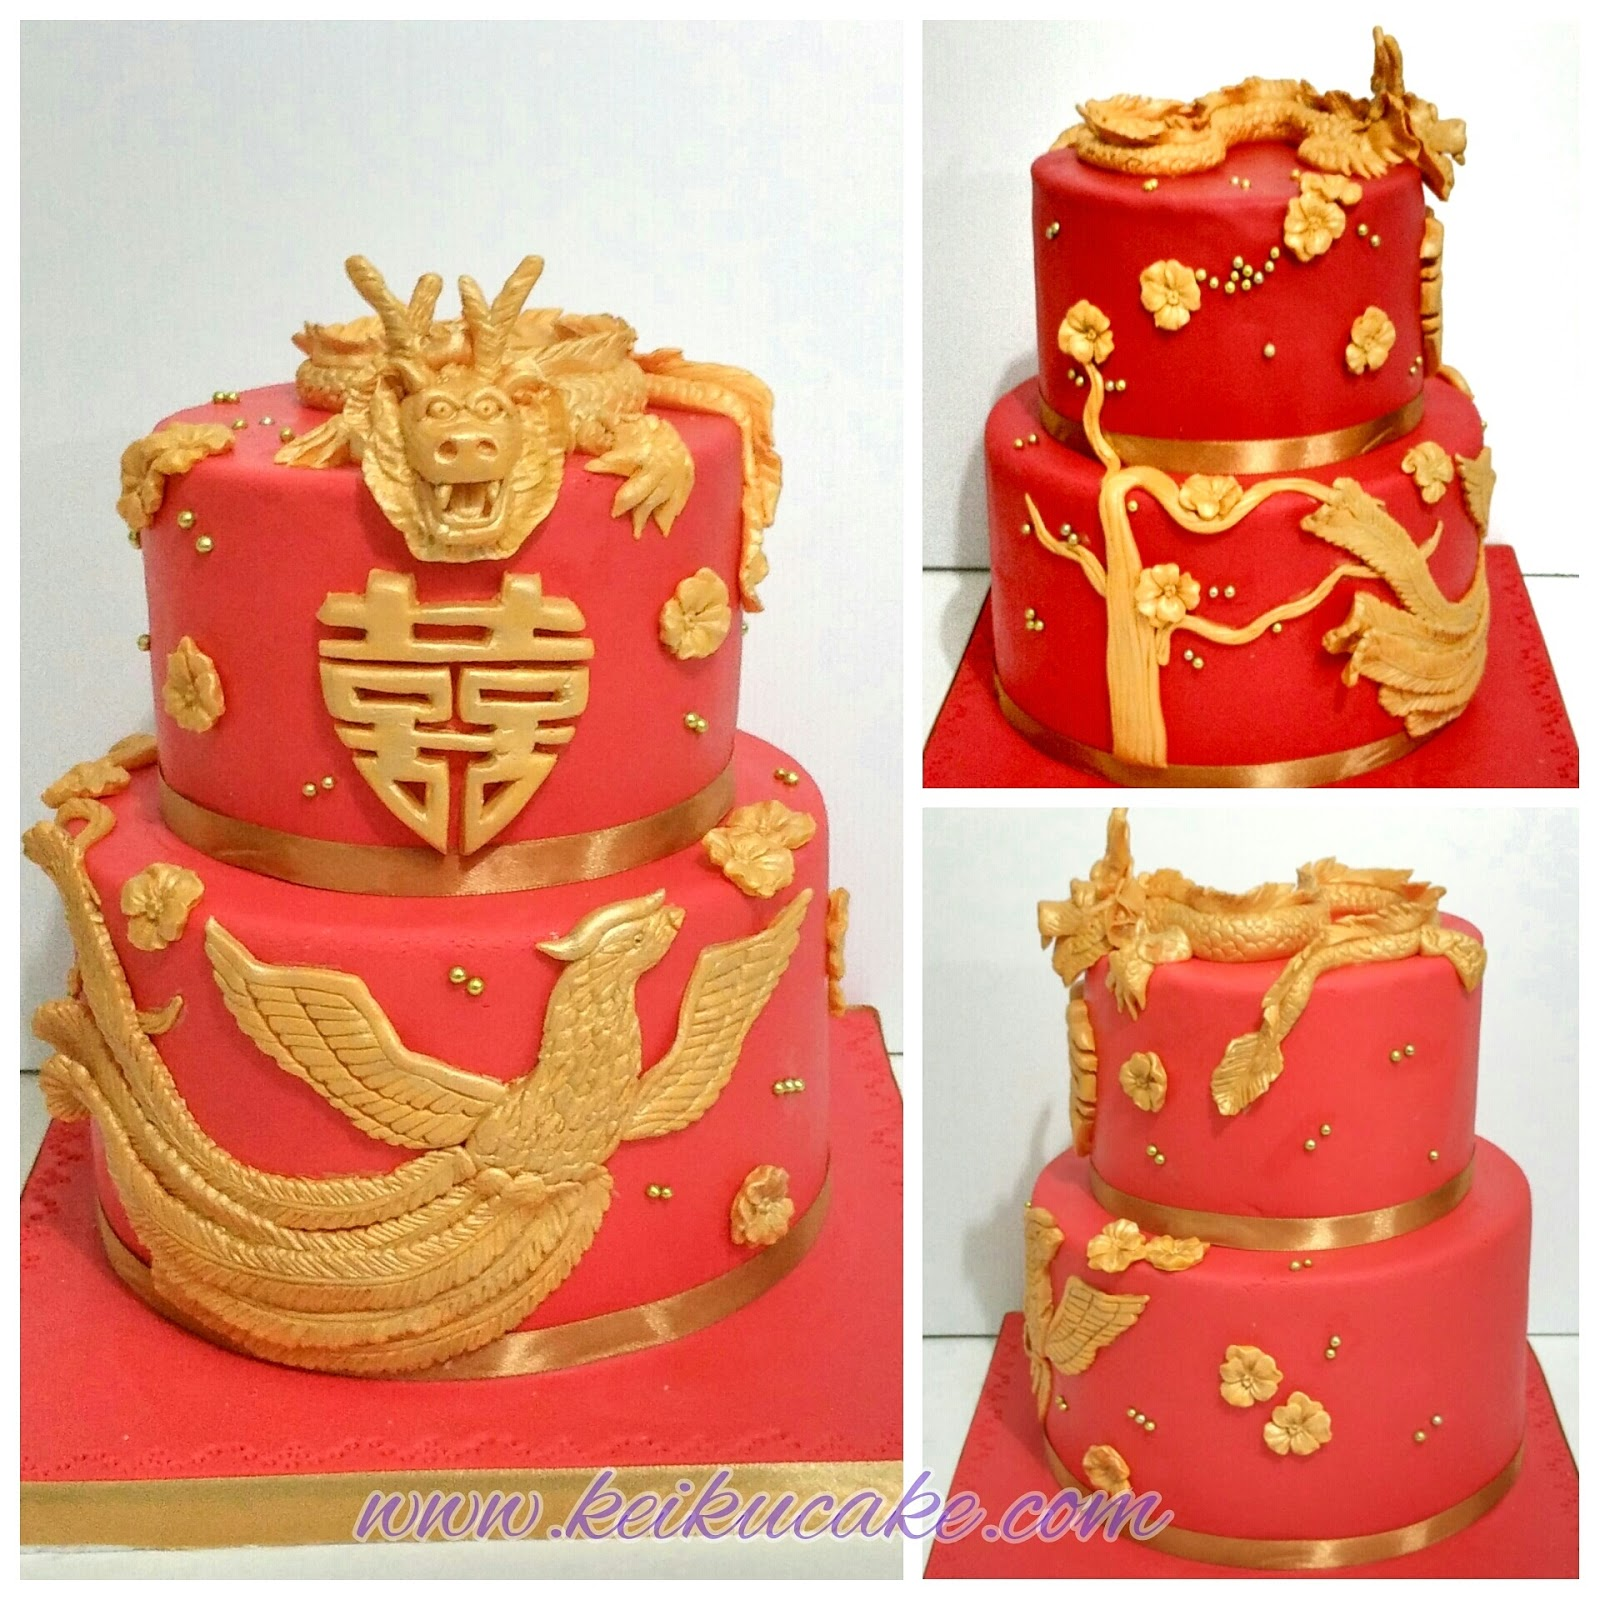 Keiku Cake Hello kitty theme engagement cake and Dragon Phoenix